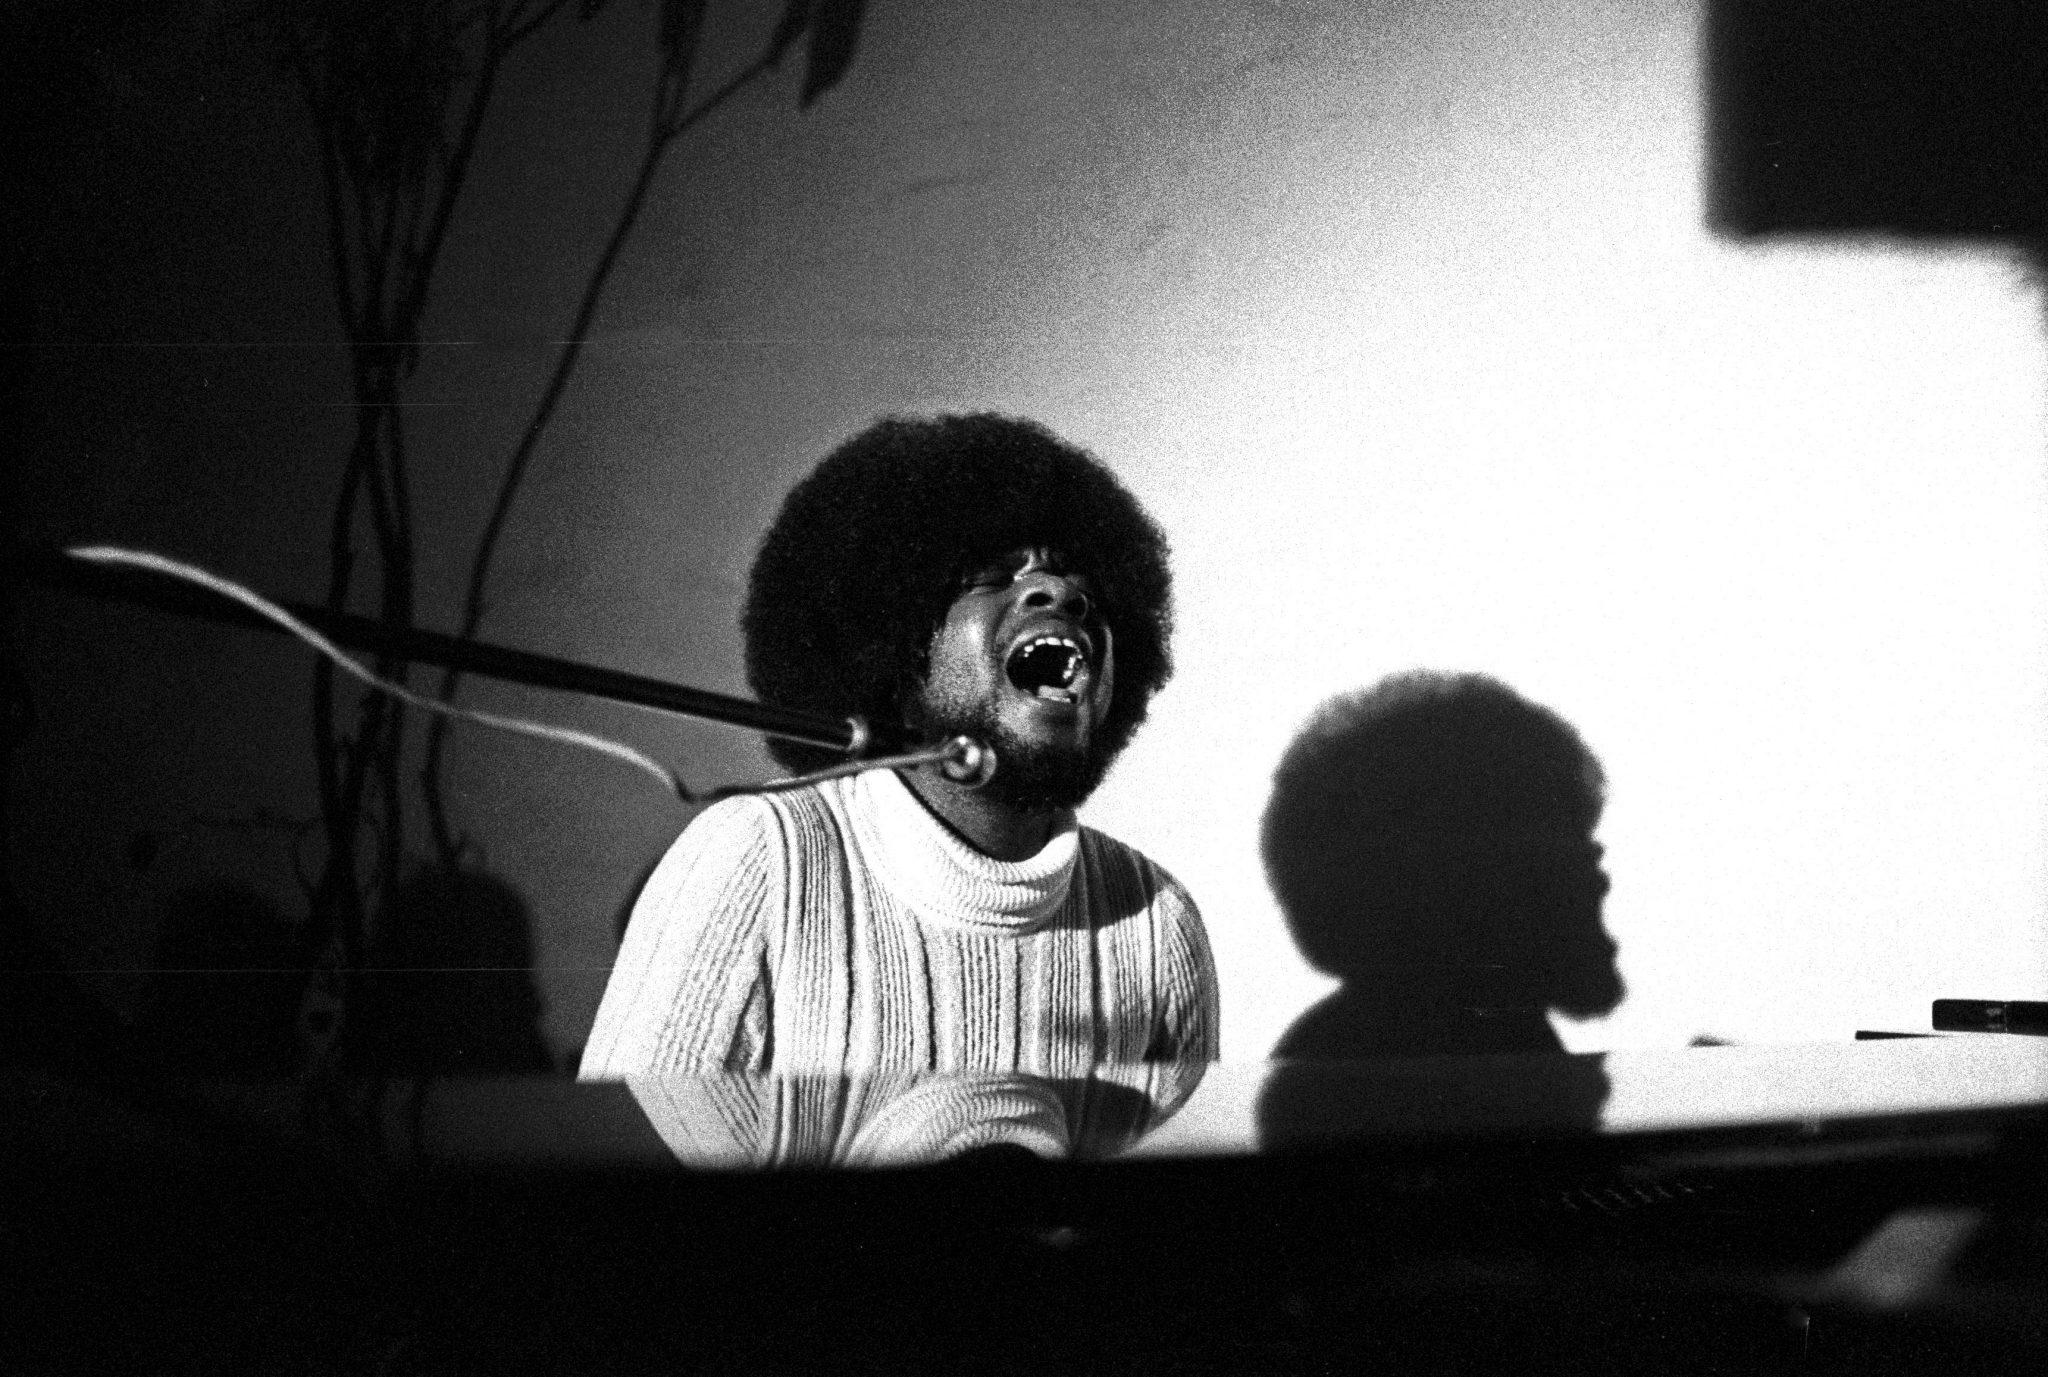 Billy_Preston_perforning_in_1971